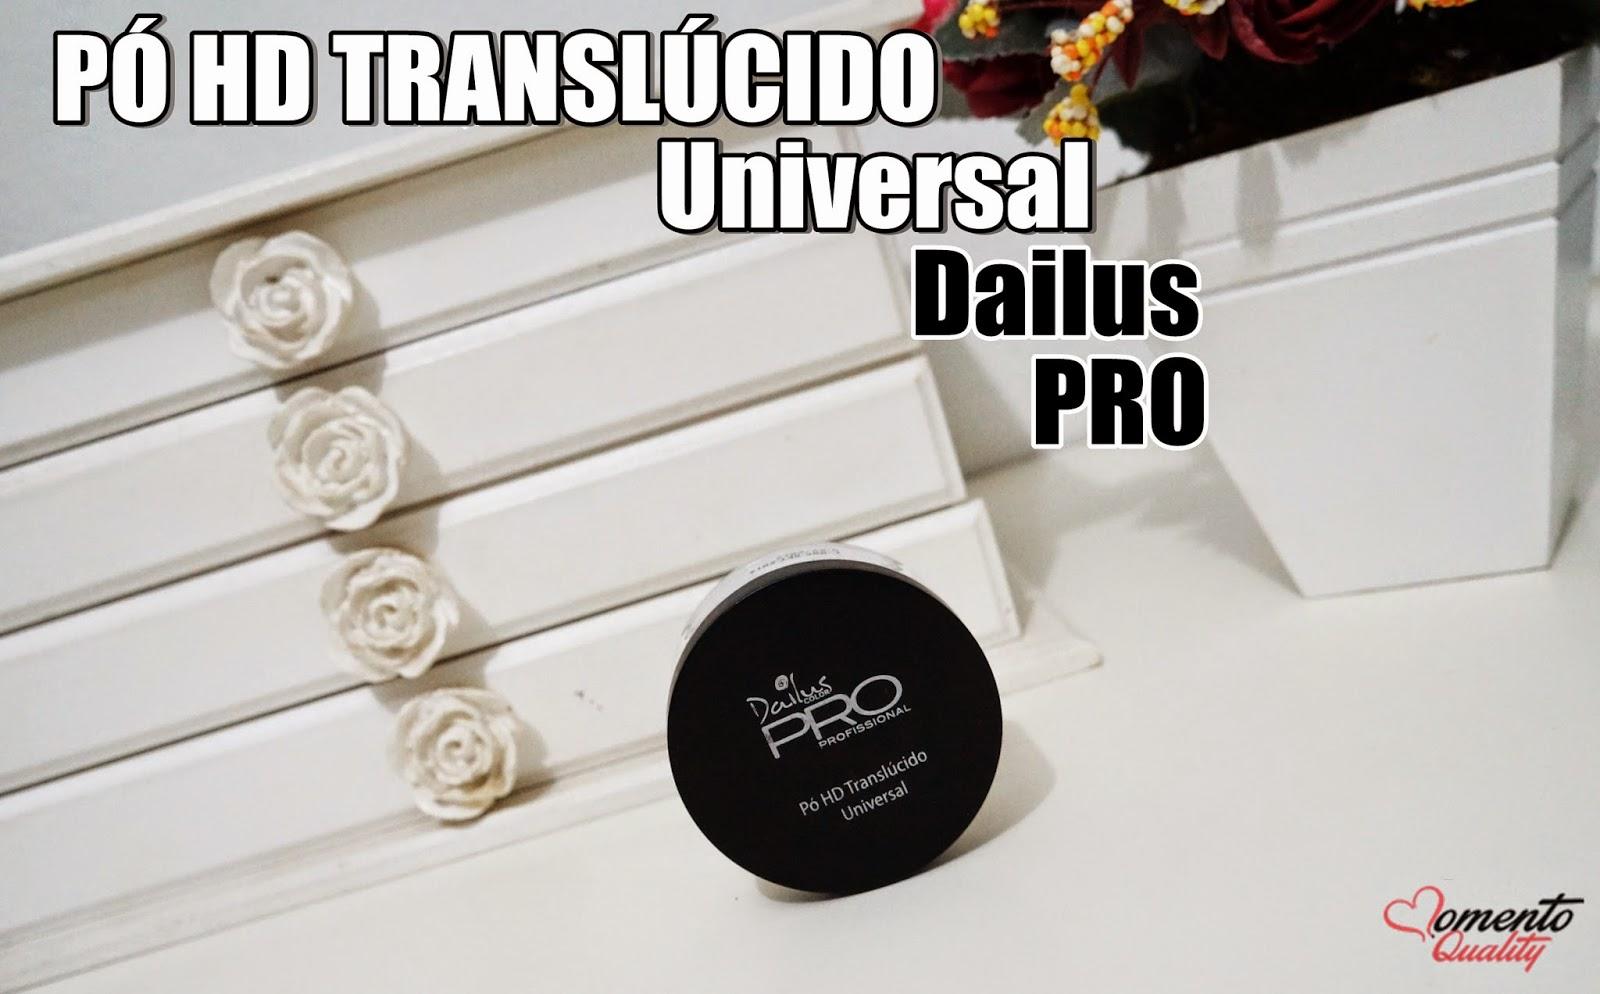 Pó HD Translúcido Universal Dailus Pro